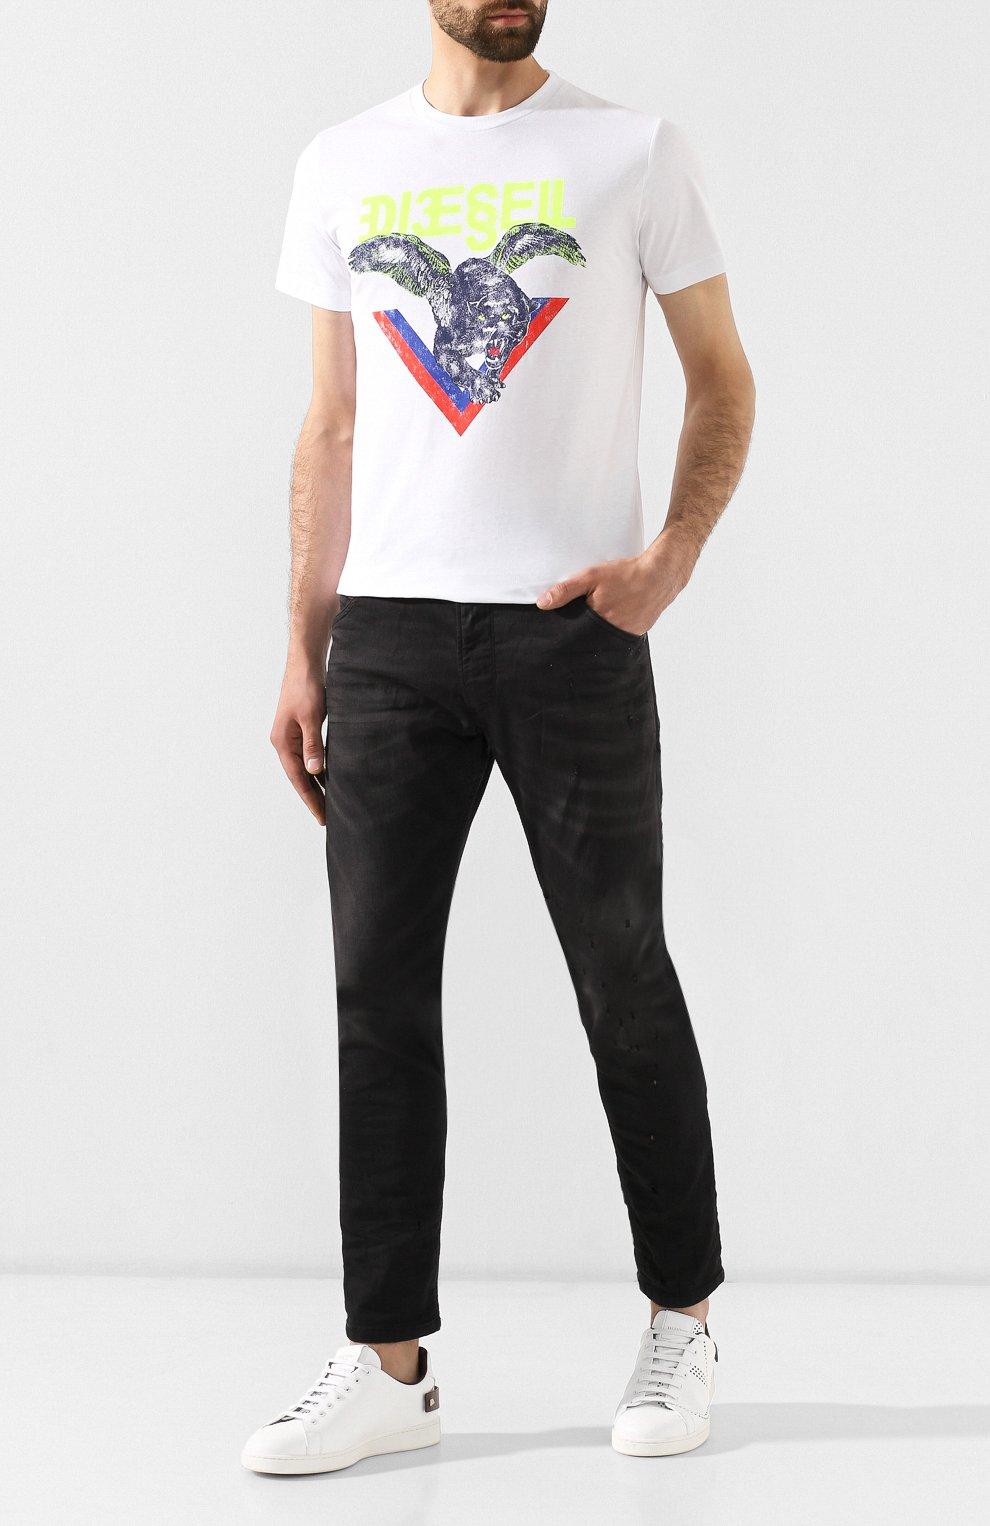 Хлопковая футболка Diesel белая   Фото №2